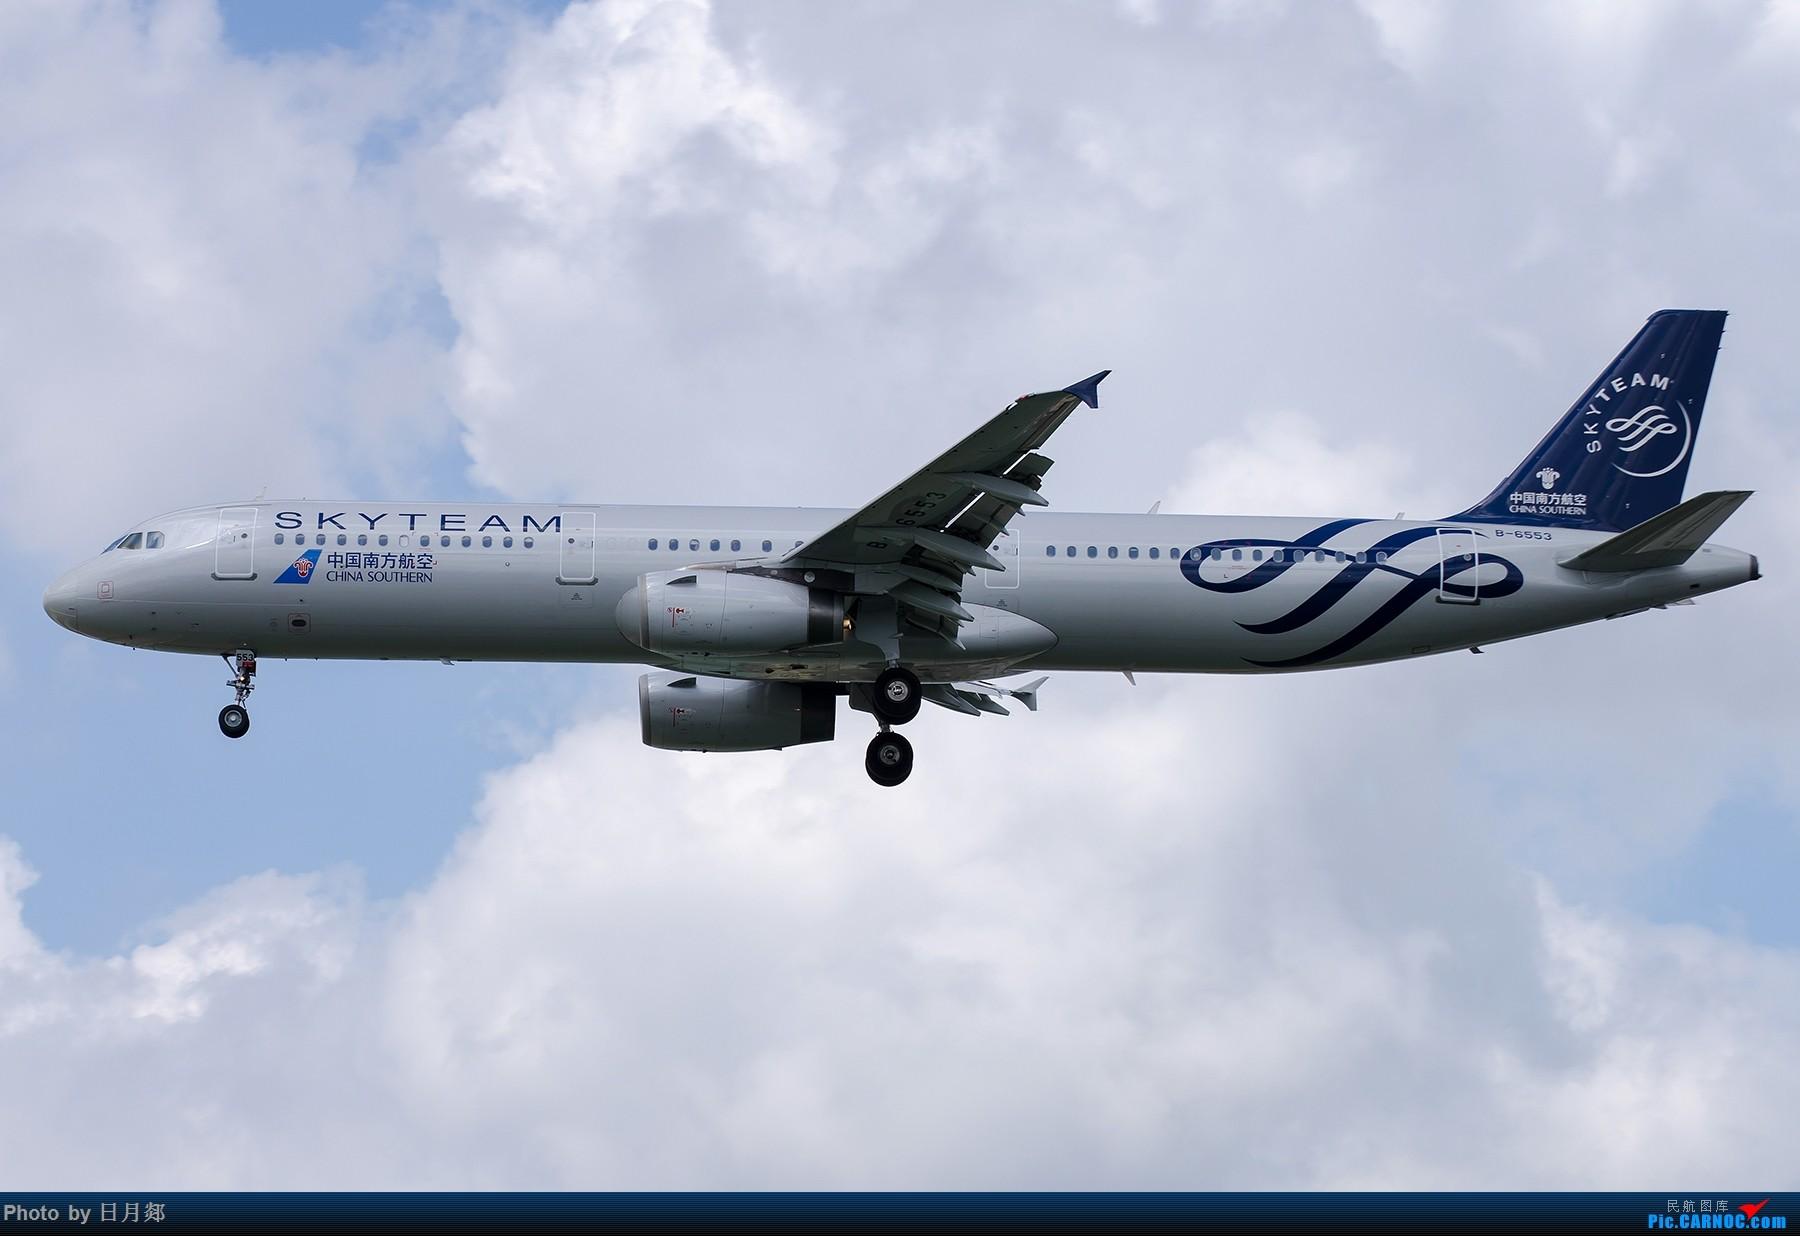 Re:[原创]【SHA拍机*1800大图】图要抓紧发,不然就要炒冷饭,大头镇贴 AIRBUS A321-200 B-6553 中国上海虹桥国际机场